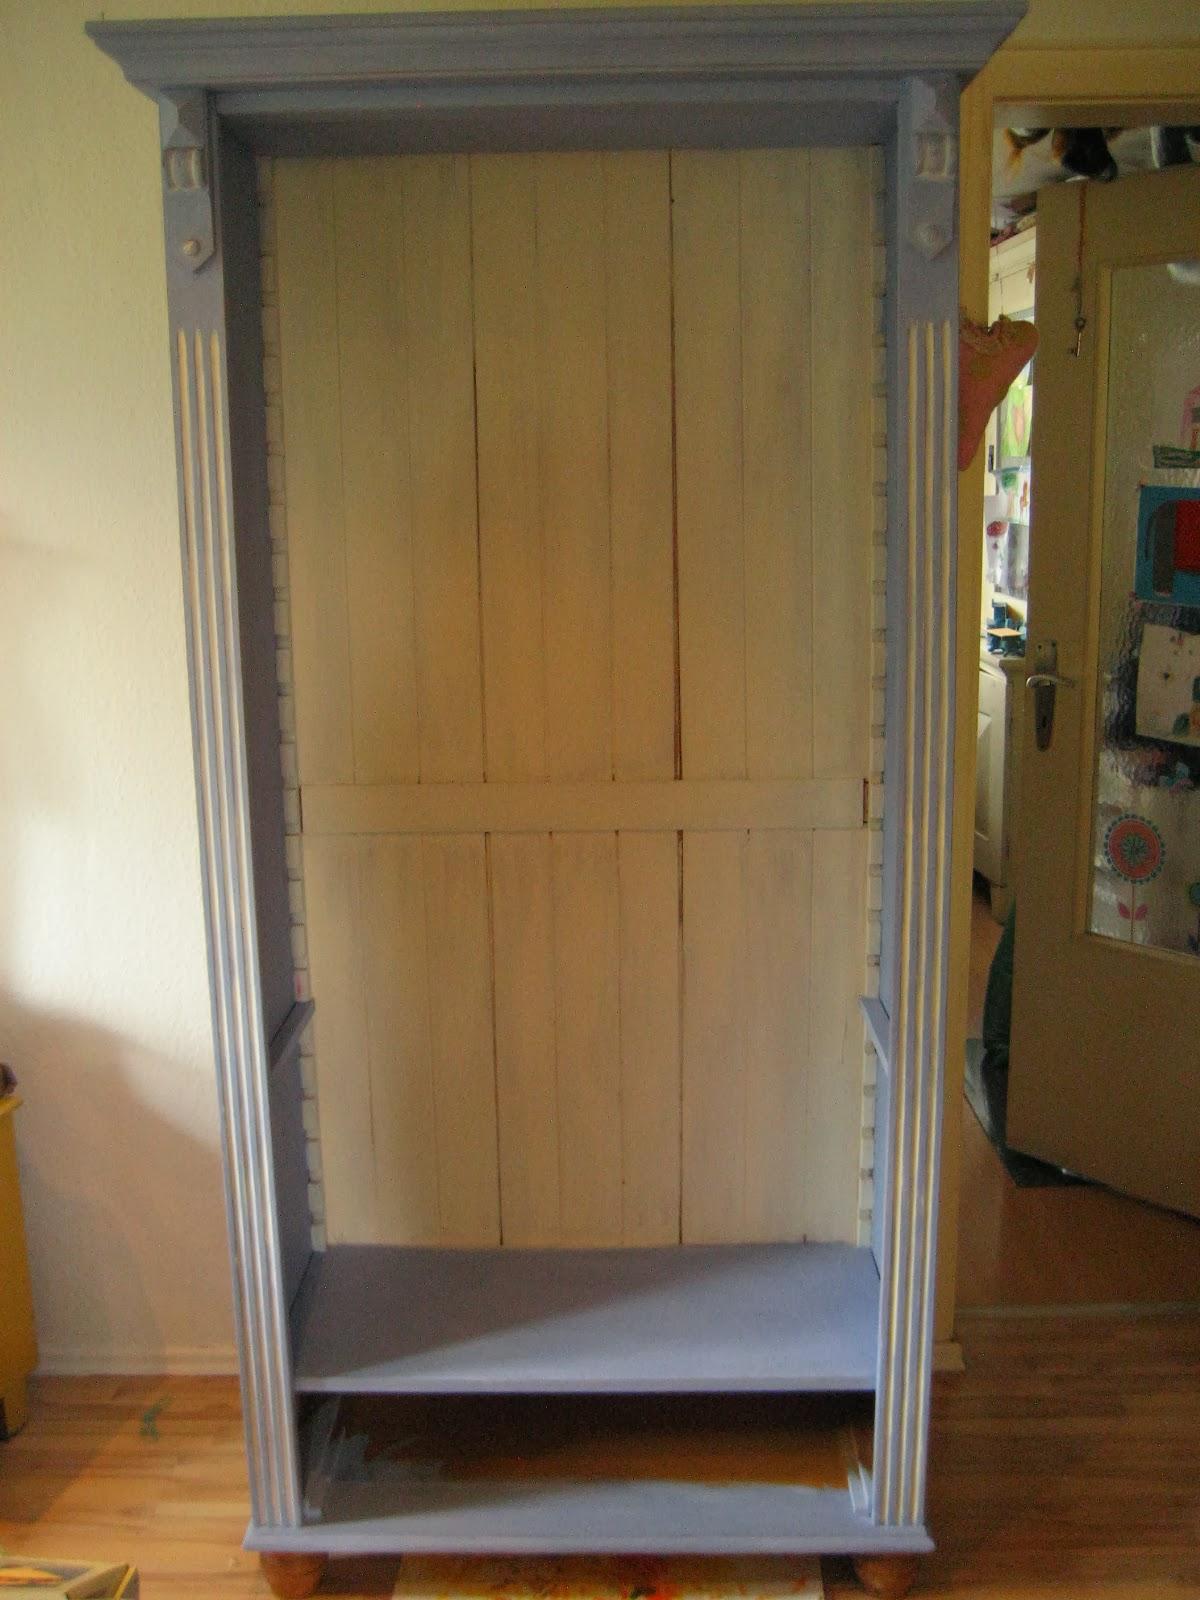 baba yaga annie sloan farben. Black Bedroom Furniture Sets. Home Design Ideas